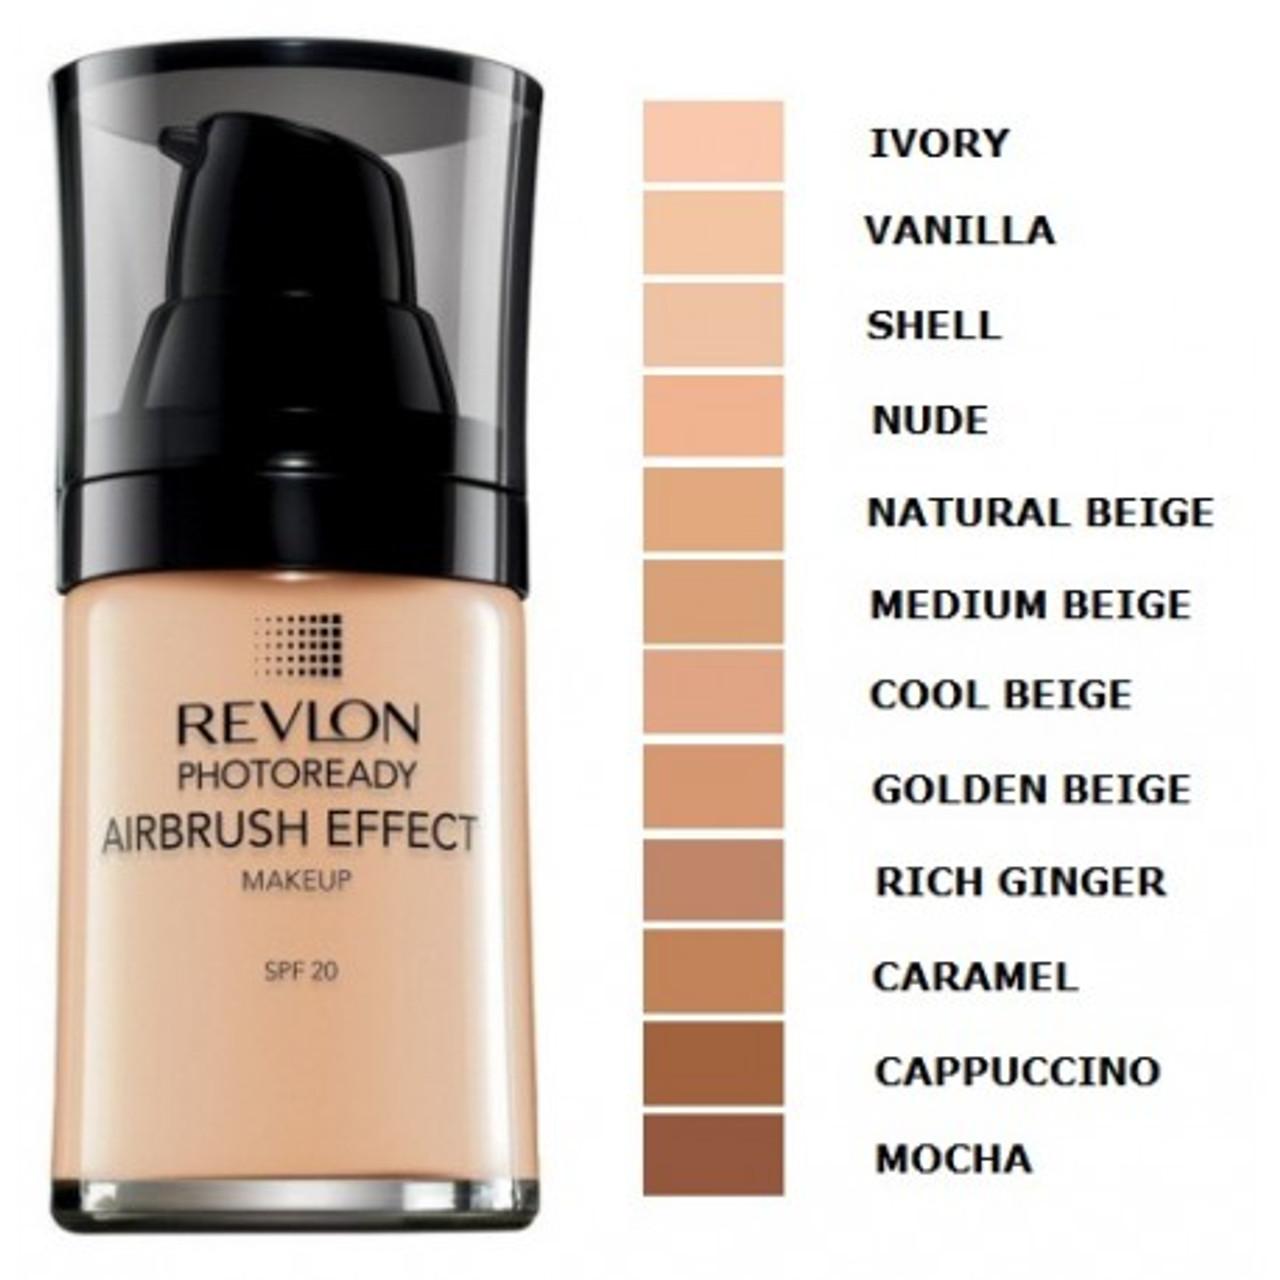 2 Pack - Revlon PhotoReady Airbrush Effect Makeup, Nude